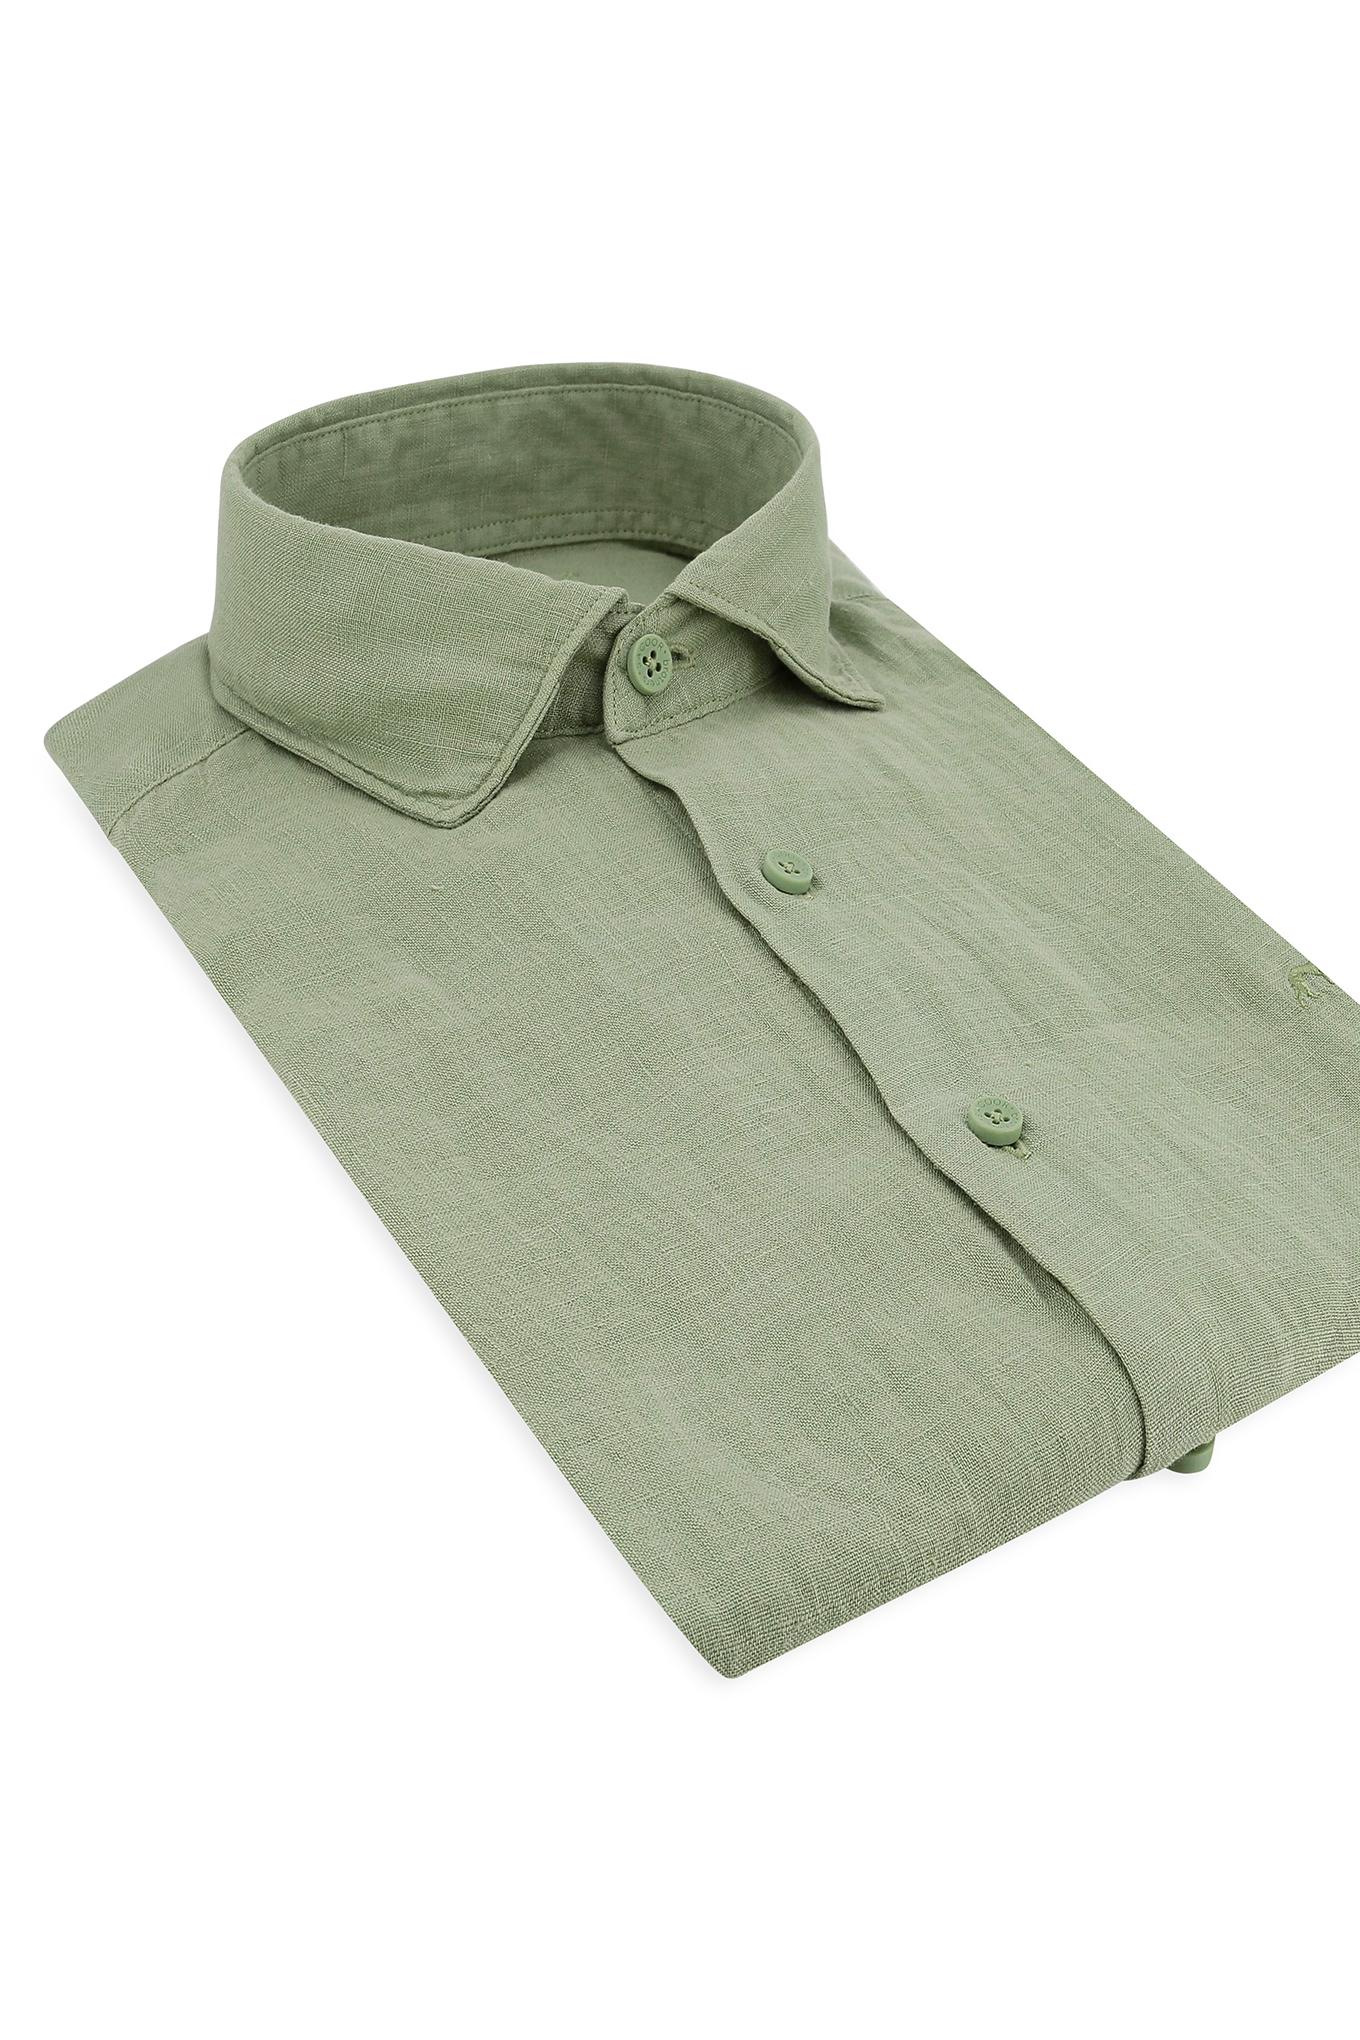 Camisa Verde Claro Casual Homem